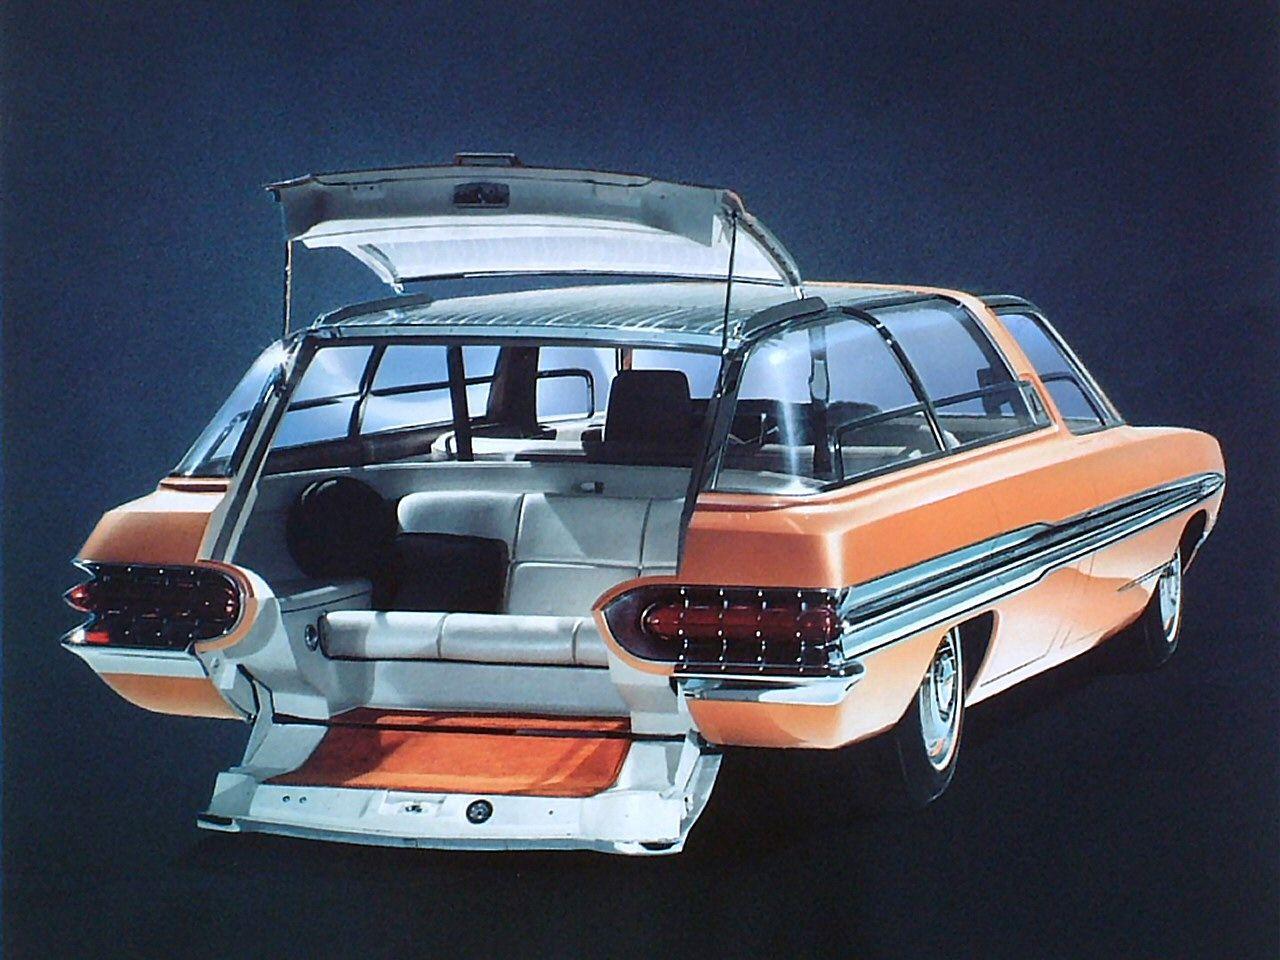 1964 Mercury Aurora Station Wagon Concept Car   Things I like to ...